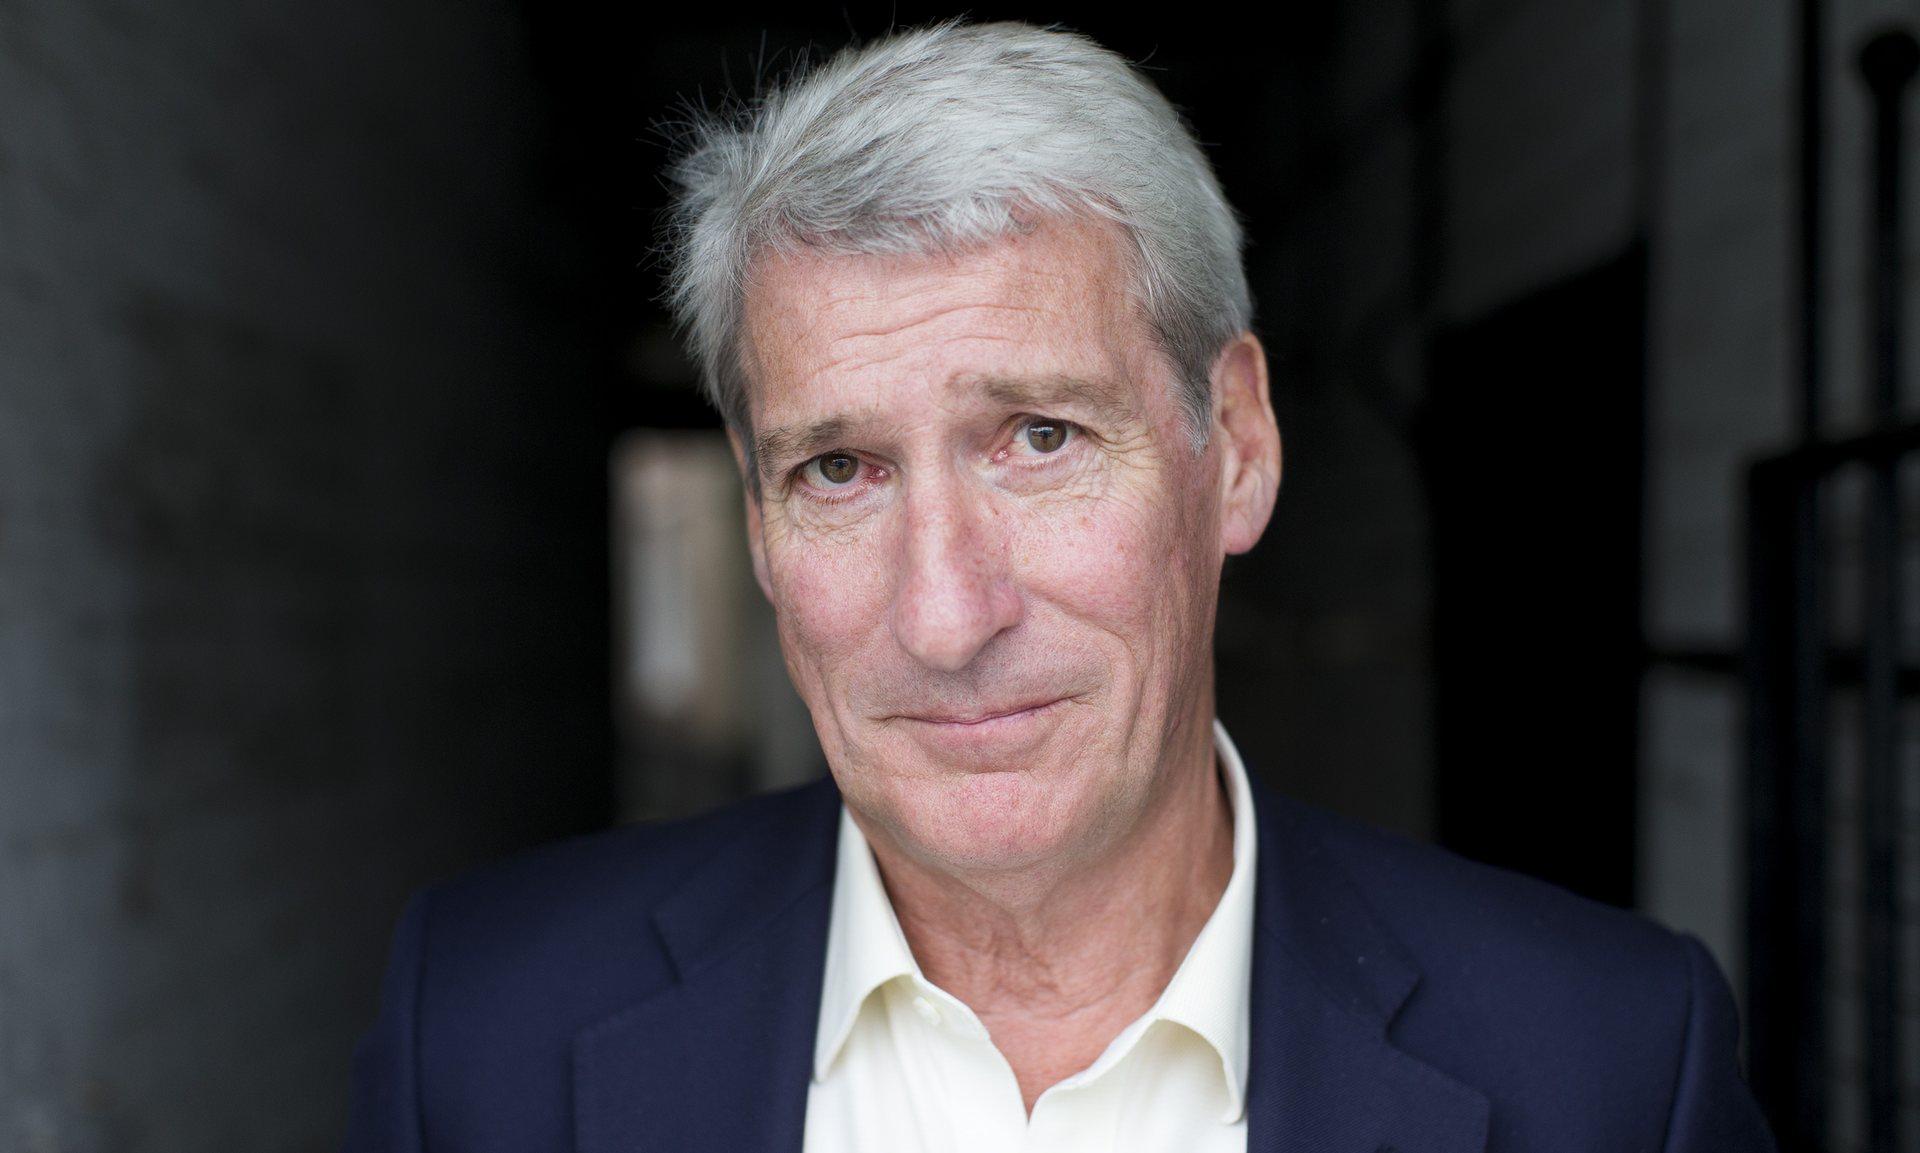 Jeremy Paxman 'baffled' by Reading's University Challenge boycott over his 'sexist' joke